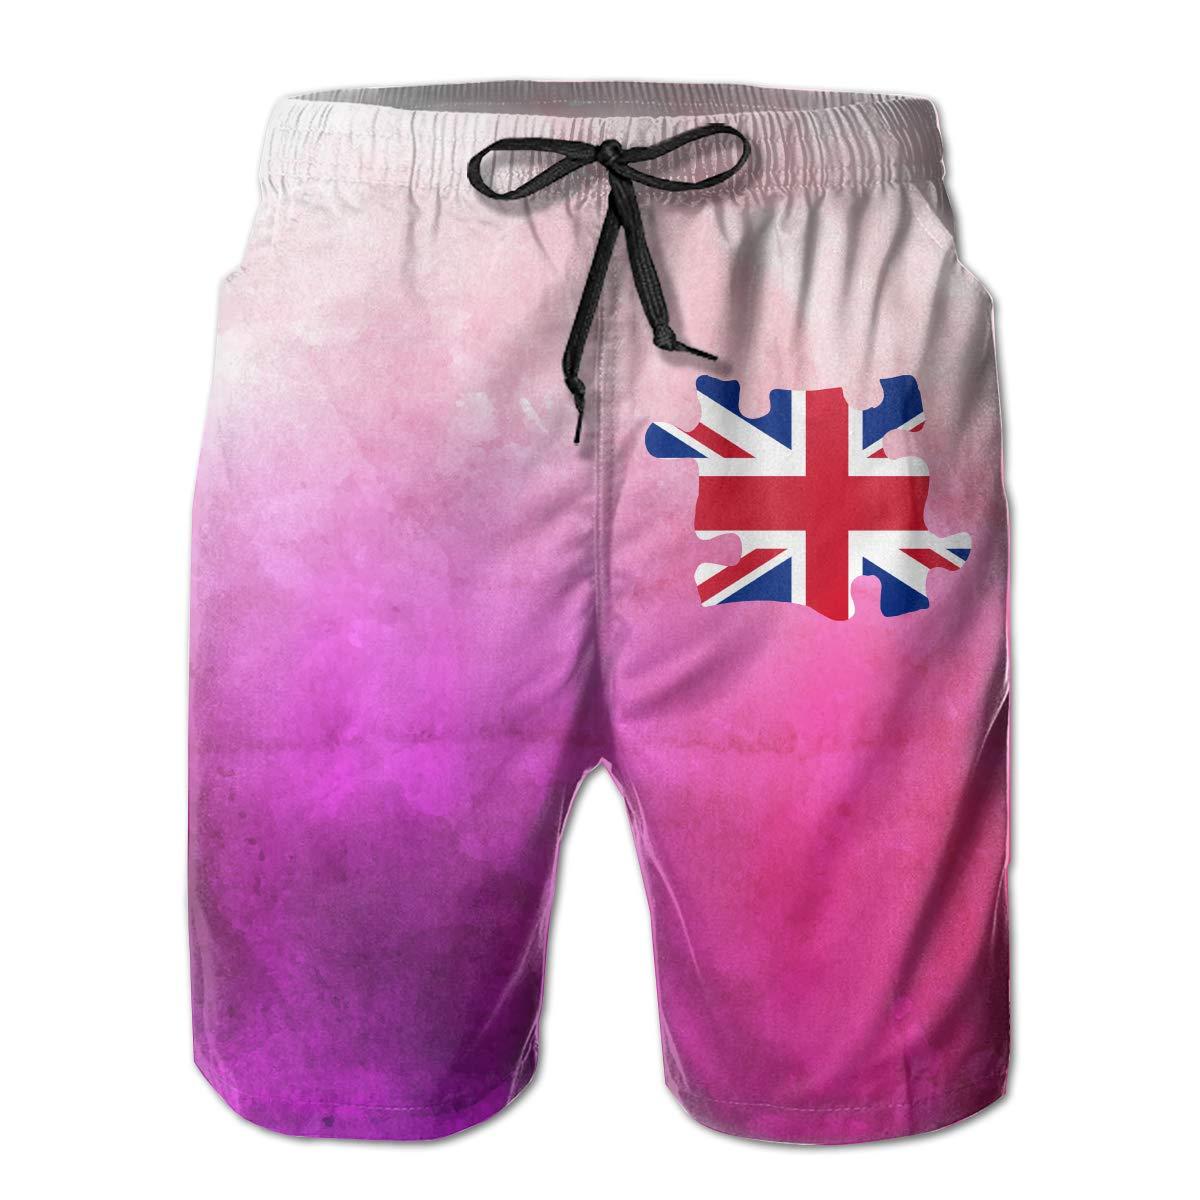 YGE.I.L25 Men Swim Trunks British Flag Autism 3 Lightweight Beach Boardshort with Pocket